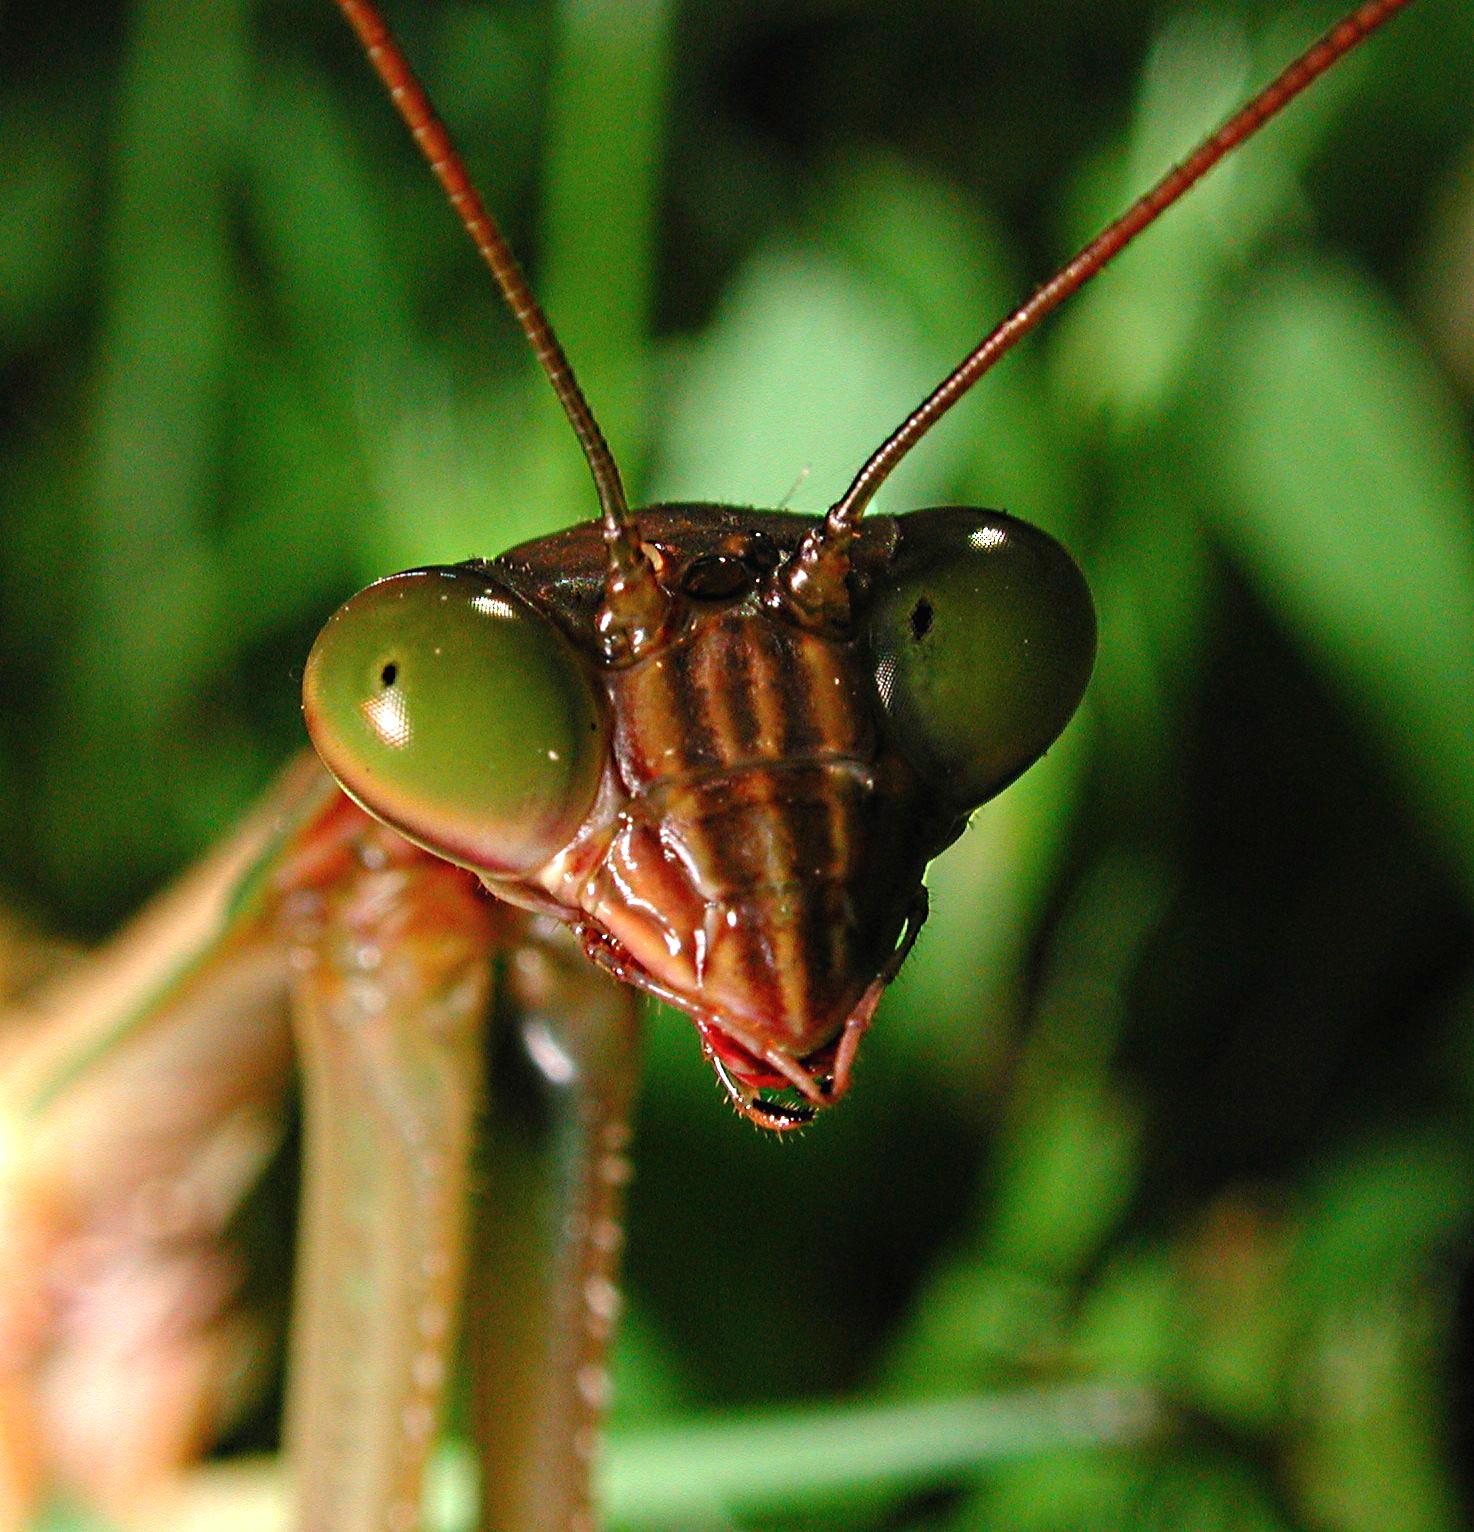 Praying Mantis Head Study. Photo by Thomas Peace 2014